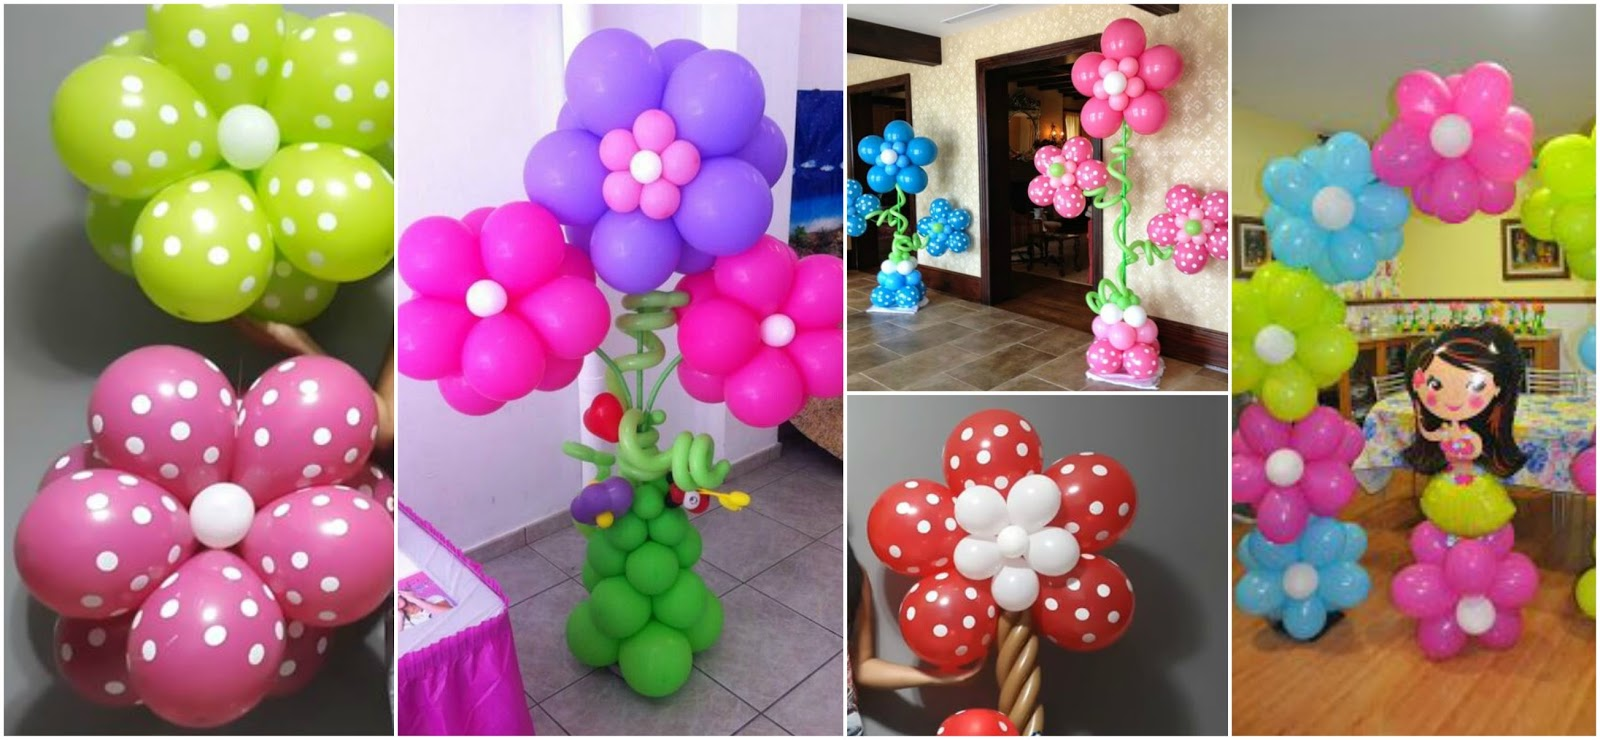 Aprende c mo decorar tus cumplea os con flores de globos - Como hacer decoracion de cumpleanos ...